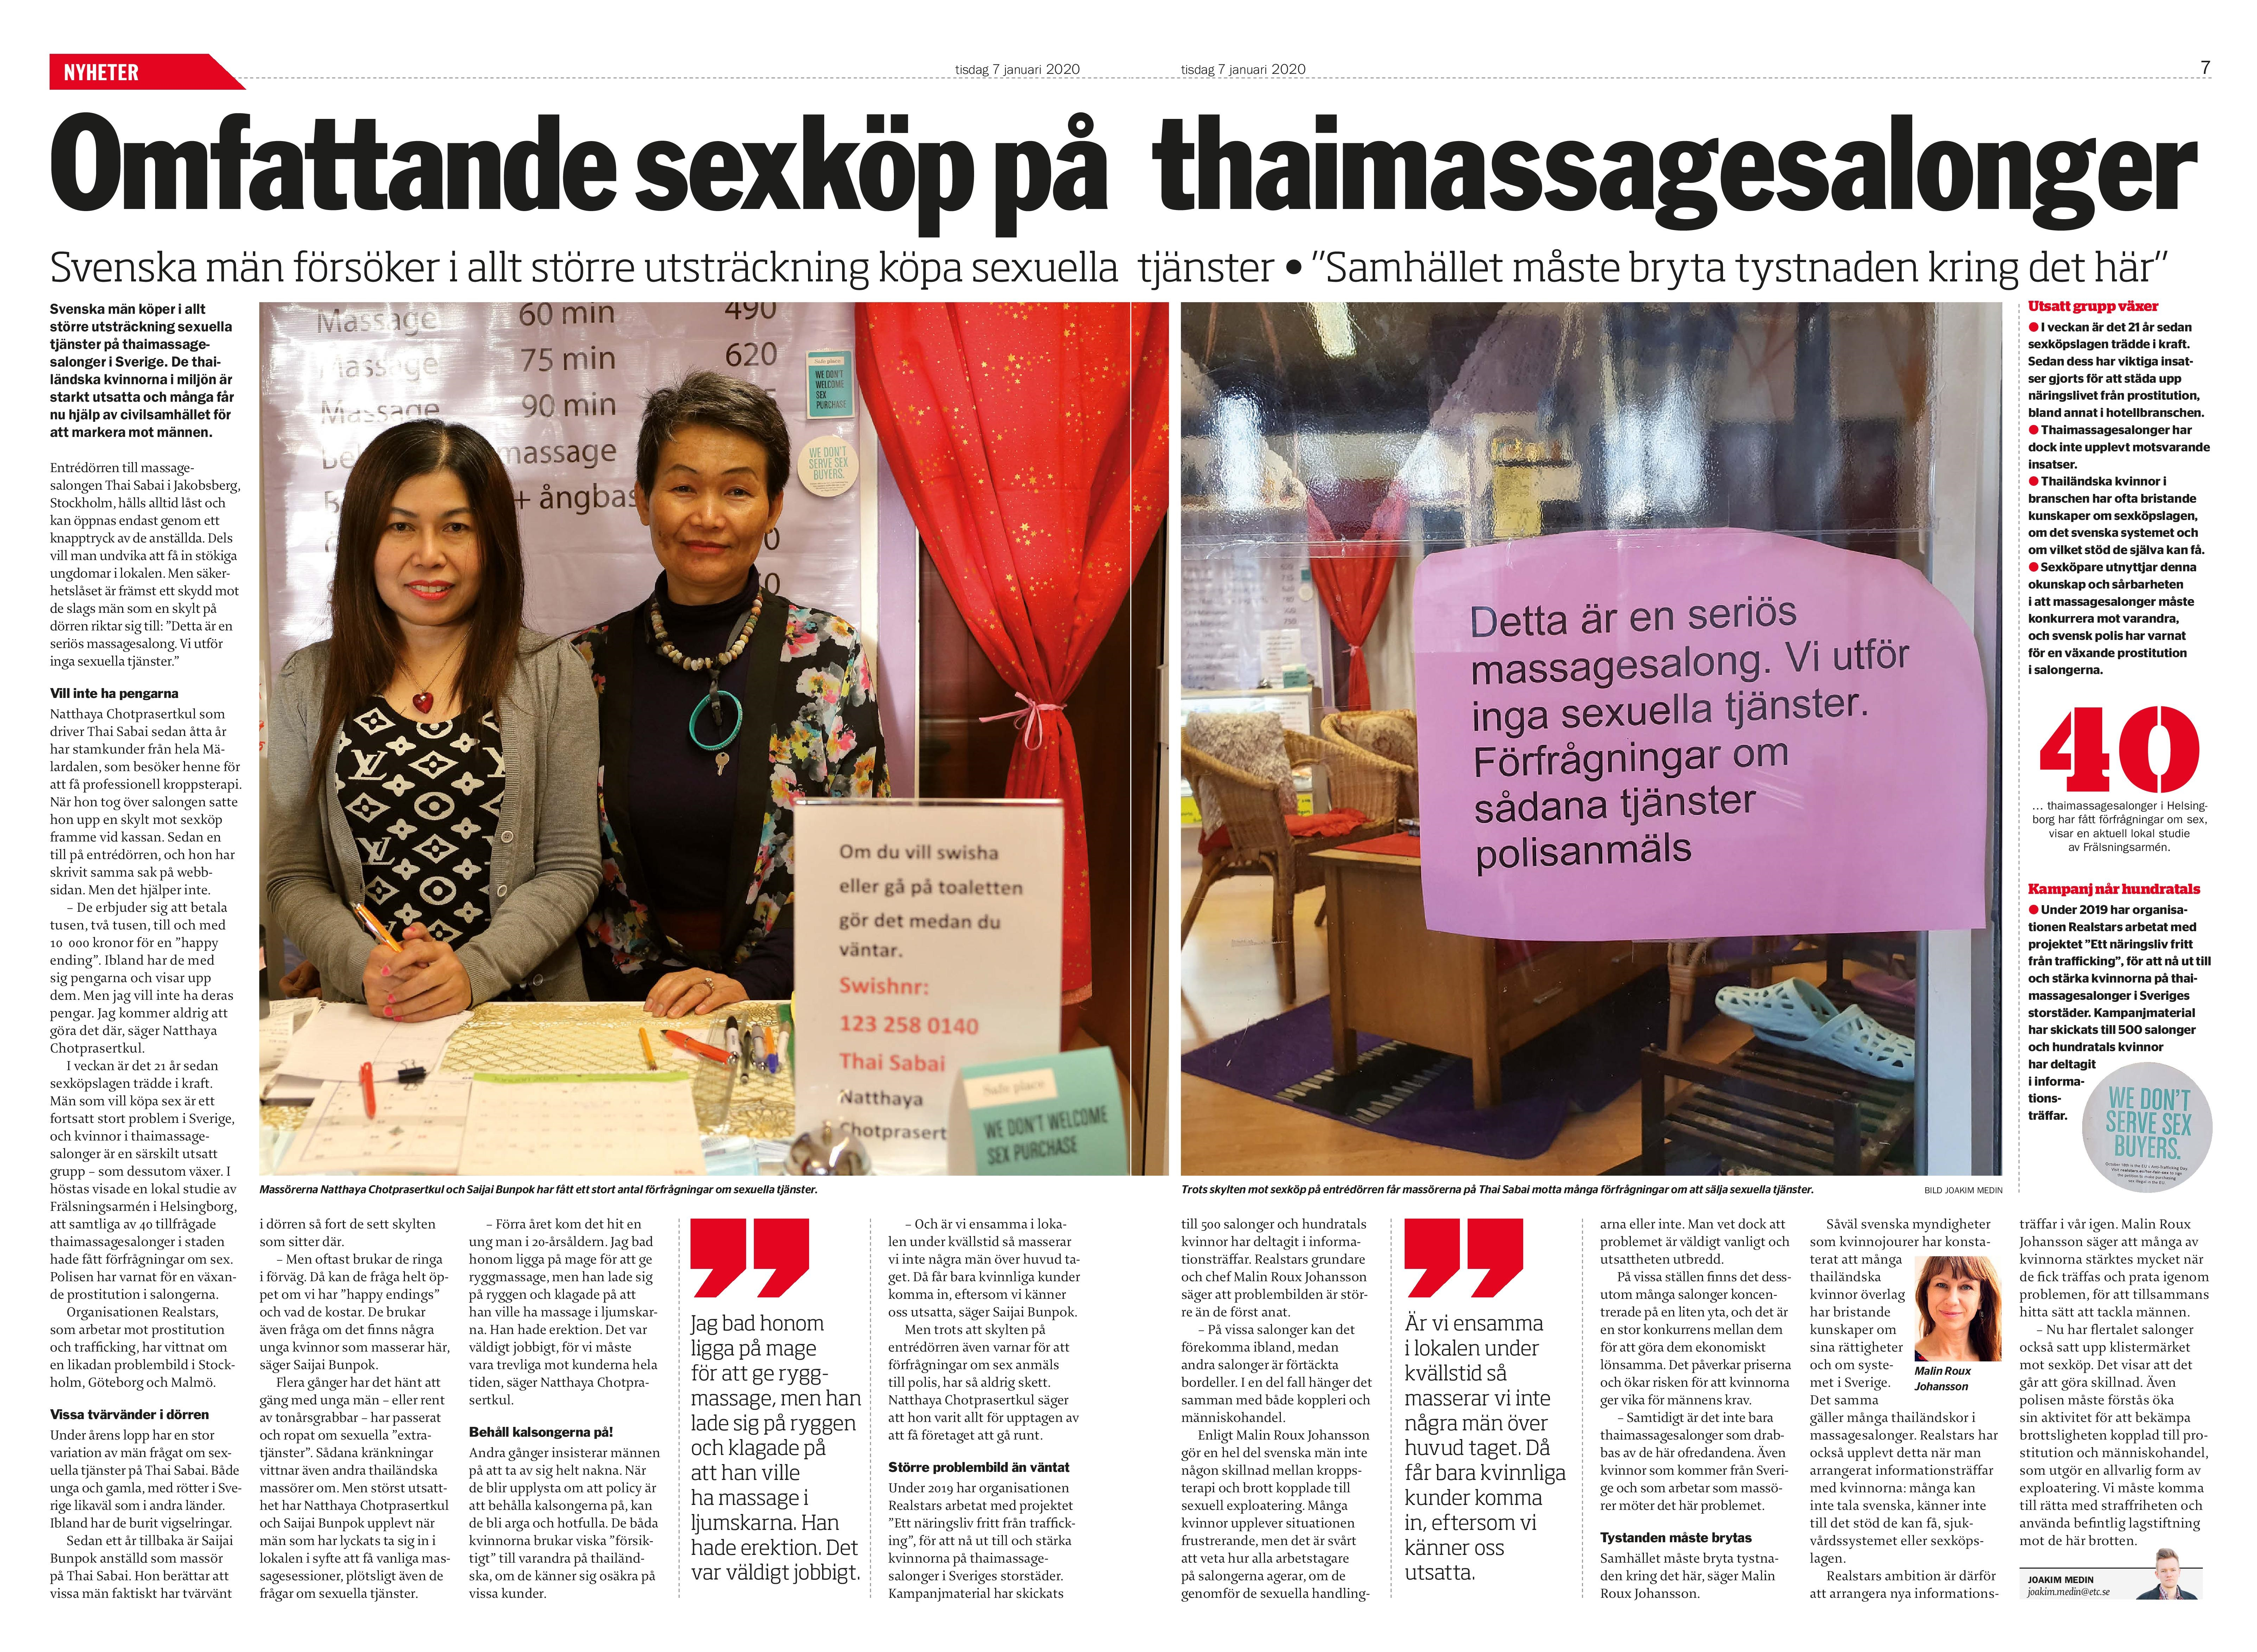 Sexköp på massagesalonger, Dagens ETC 2020-01-07